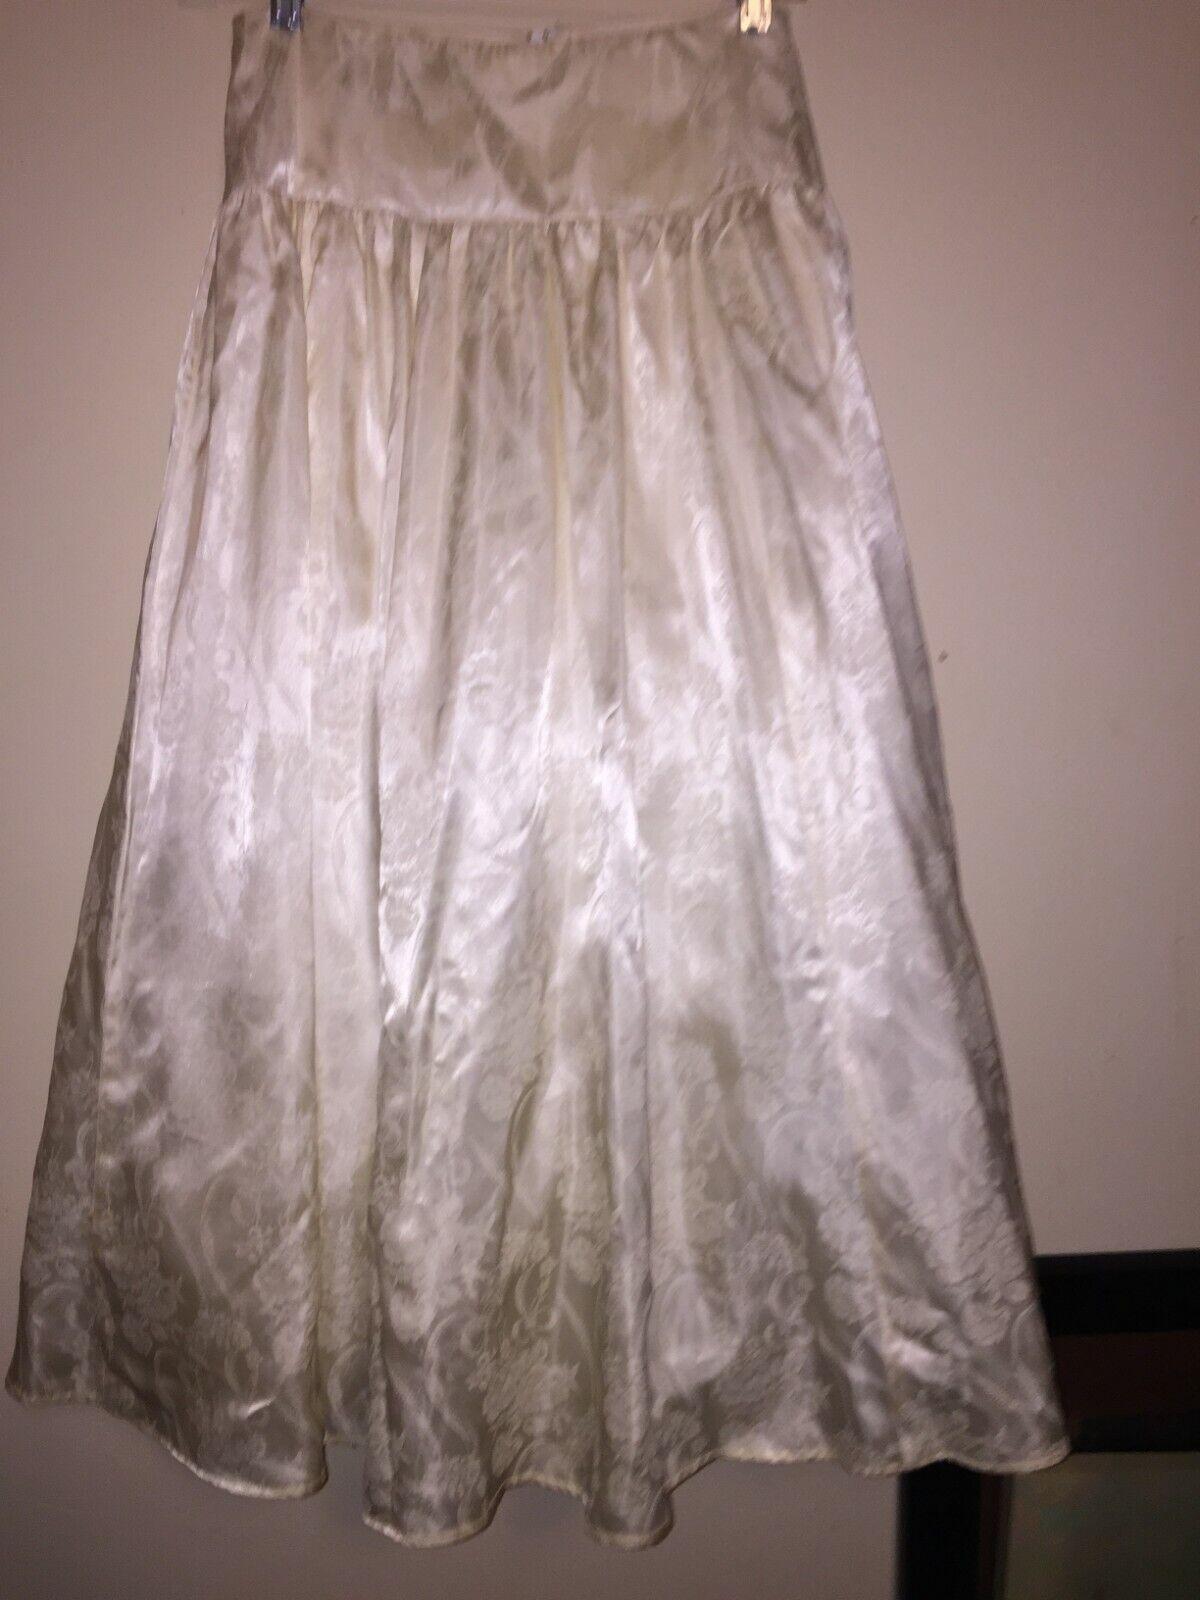 VINTAGE Jessica McClintock Crinoline Skirt 80s - image 2